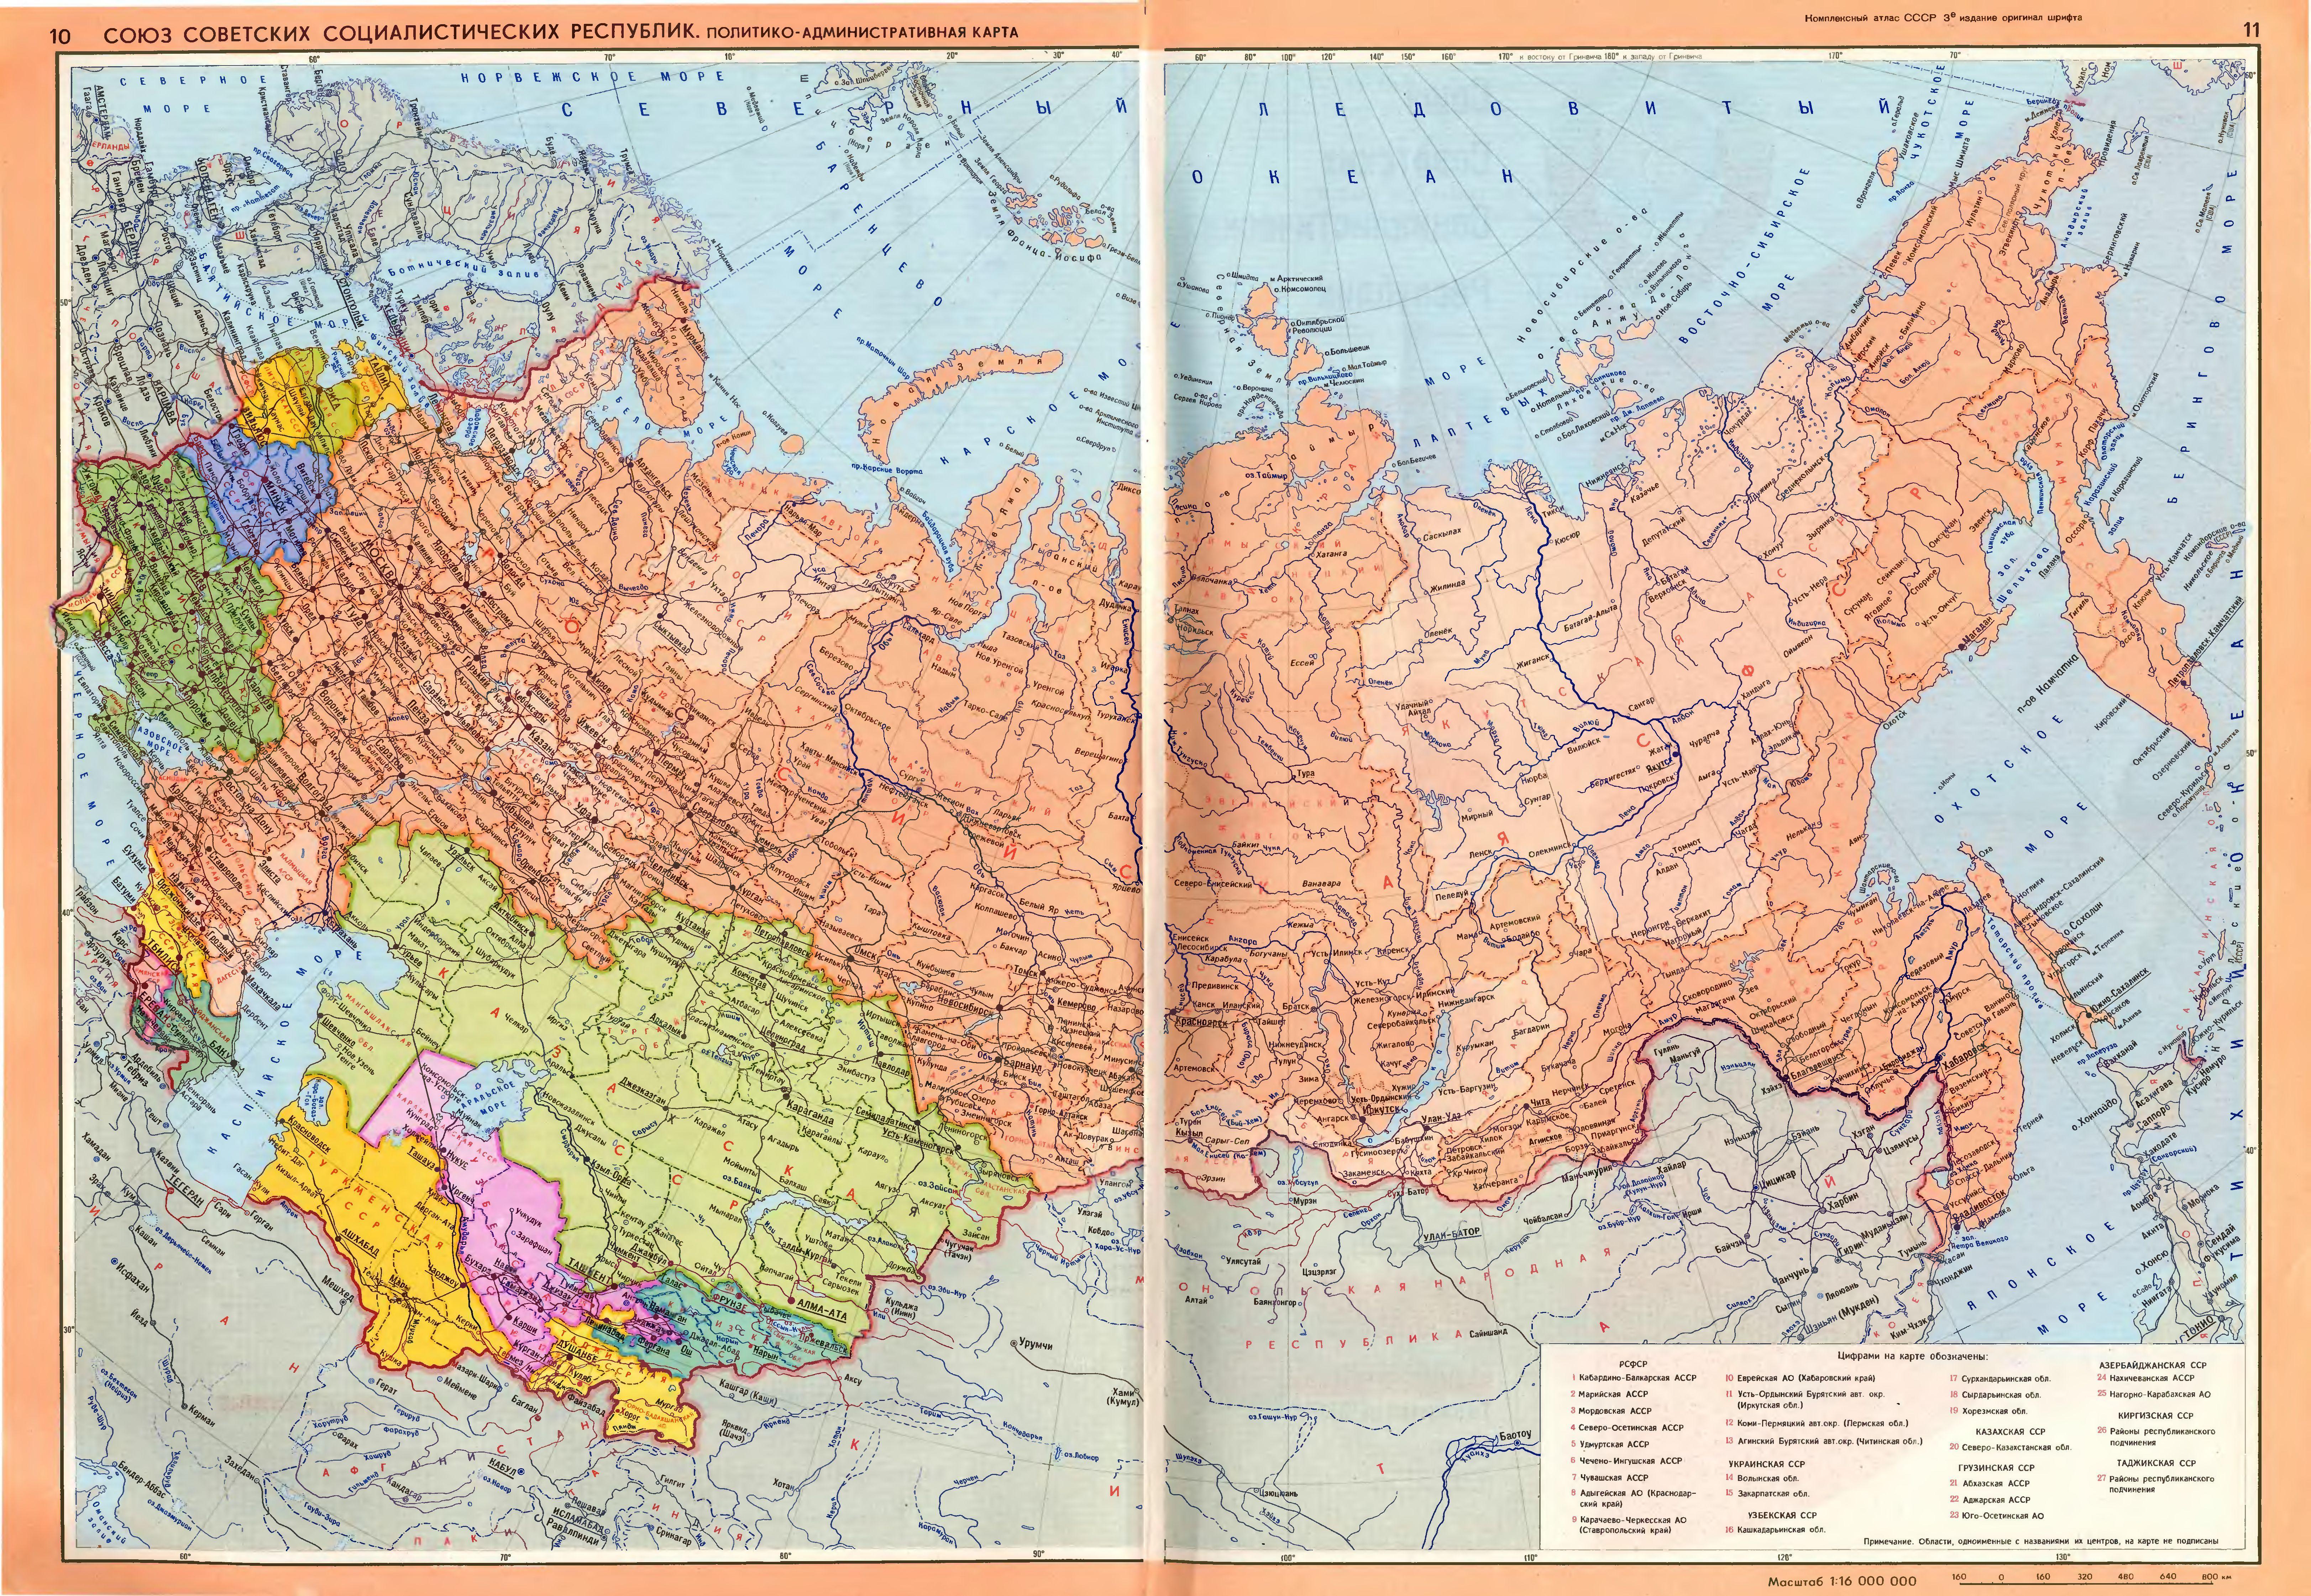 Politicheskaya Karta Sssr Atlas Sssr 1983 Karta Sovetskij Soyuz